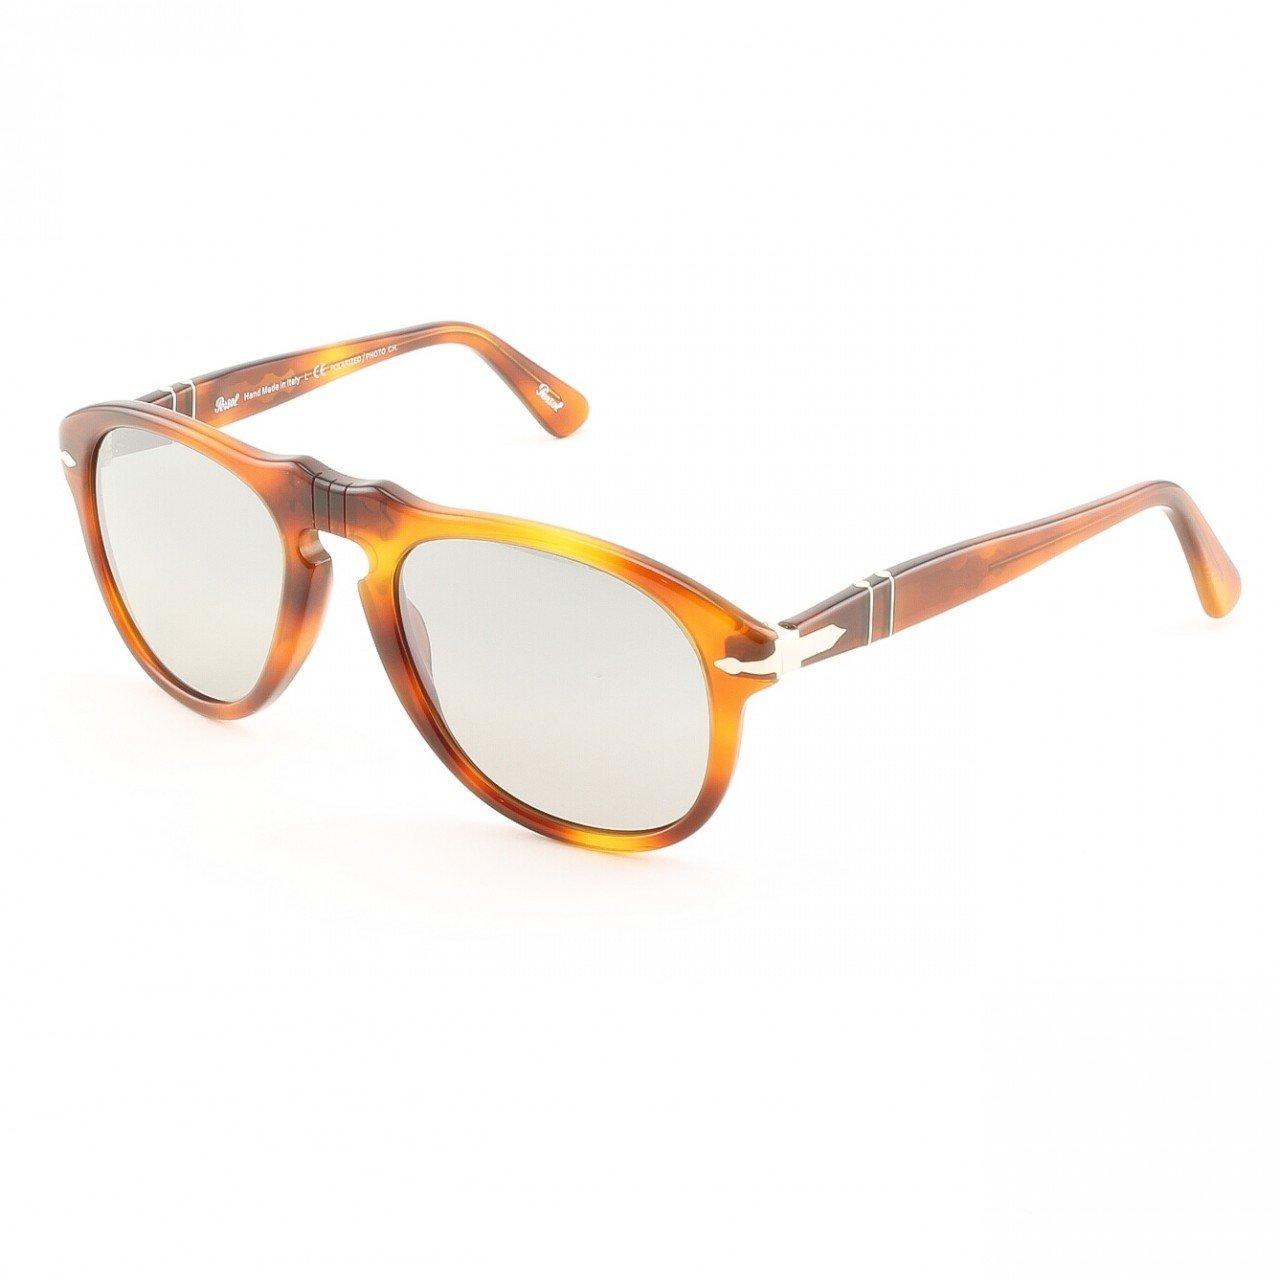 Persol PO0649 96/82 52mm Light Havana Sunglasses with Grey Photochromic Polarized Lenses